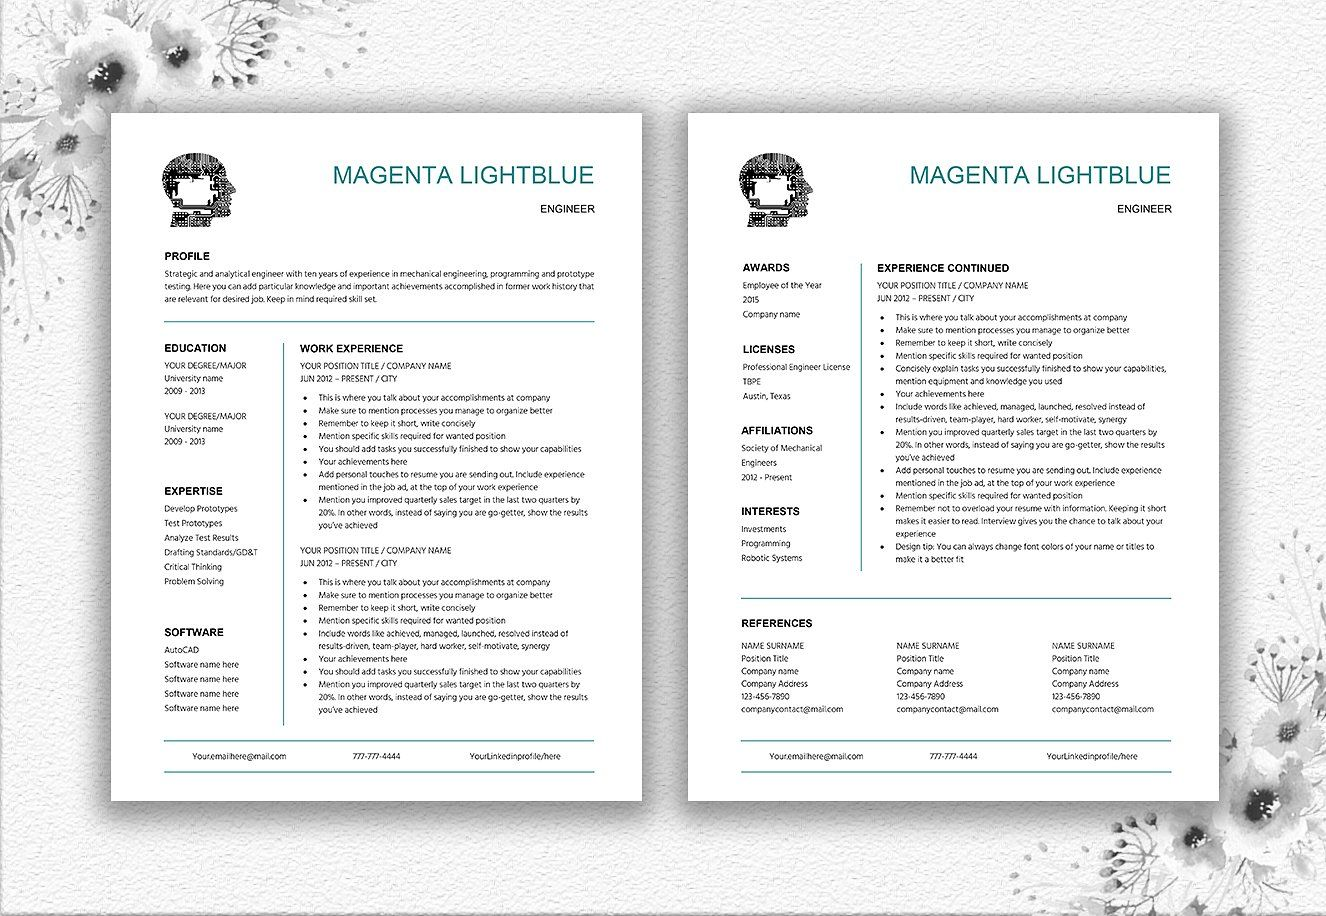 Engineer resume cv template by documentfolder on